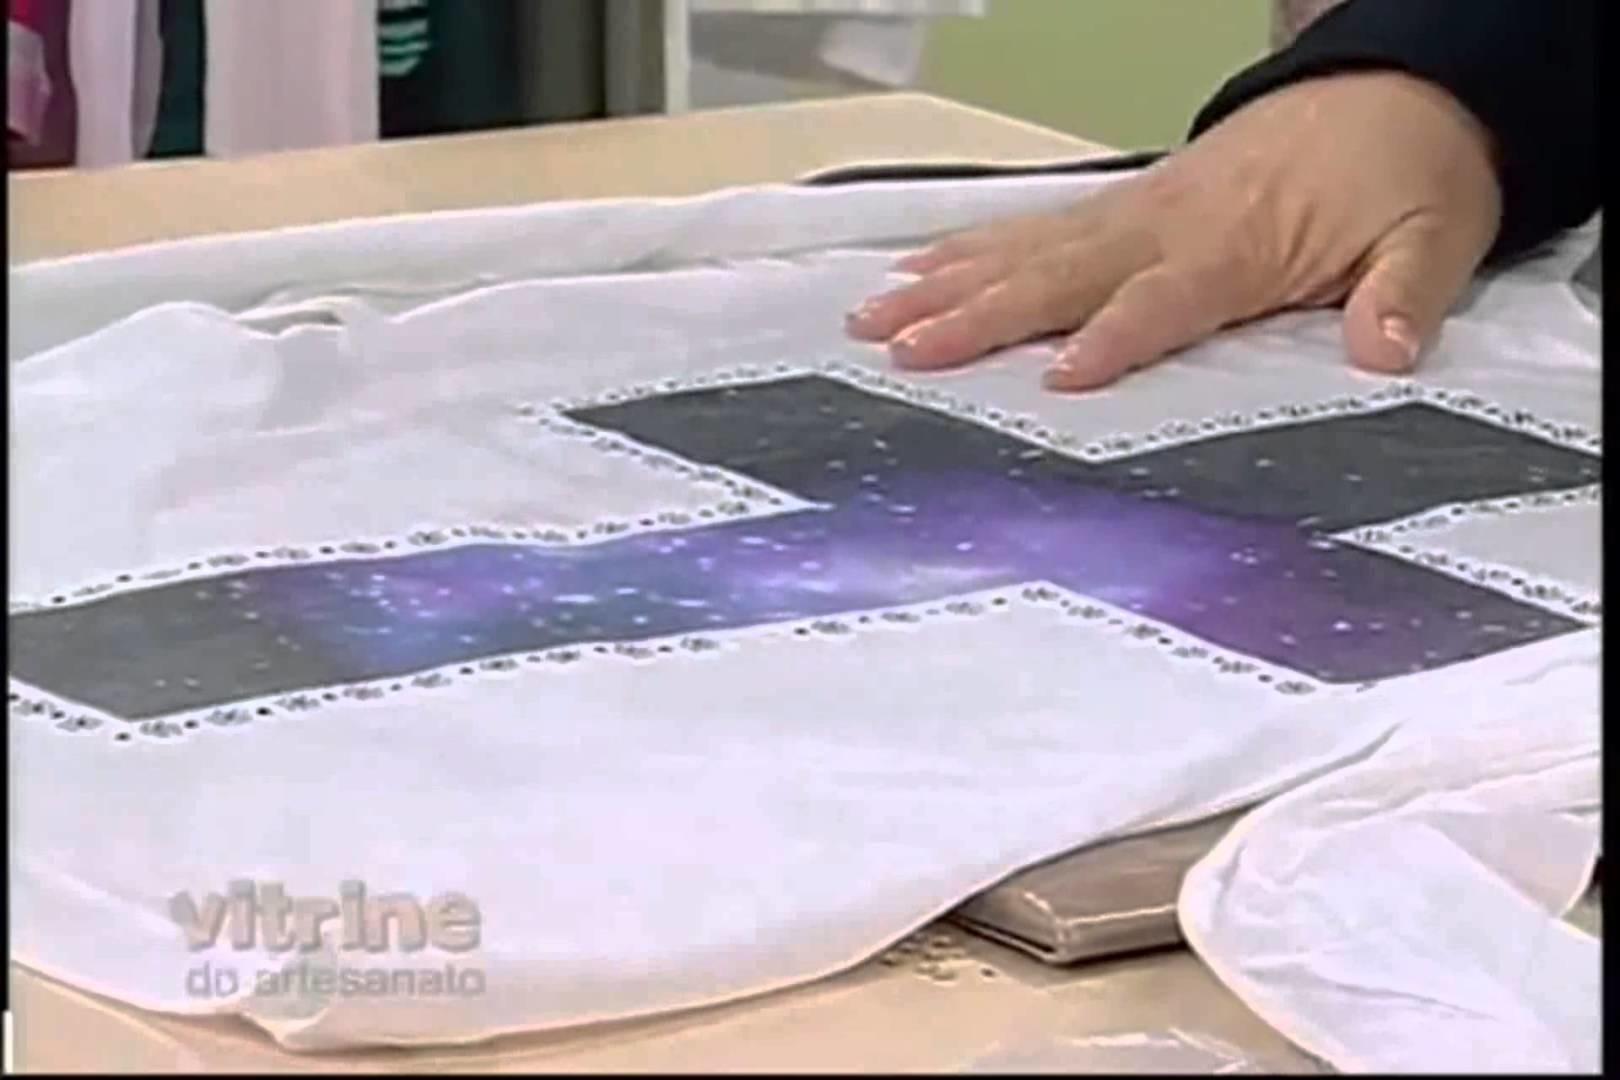 Vitrine do Artesanato - SBT Litoral - 02.08.2013